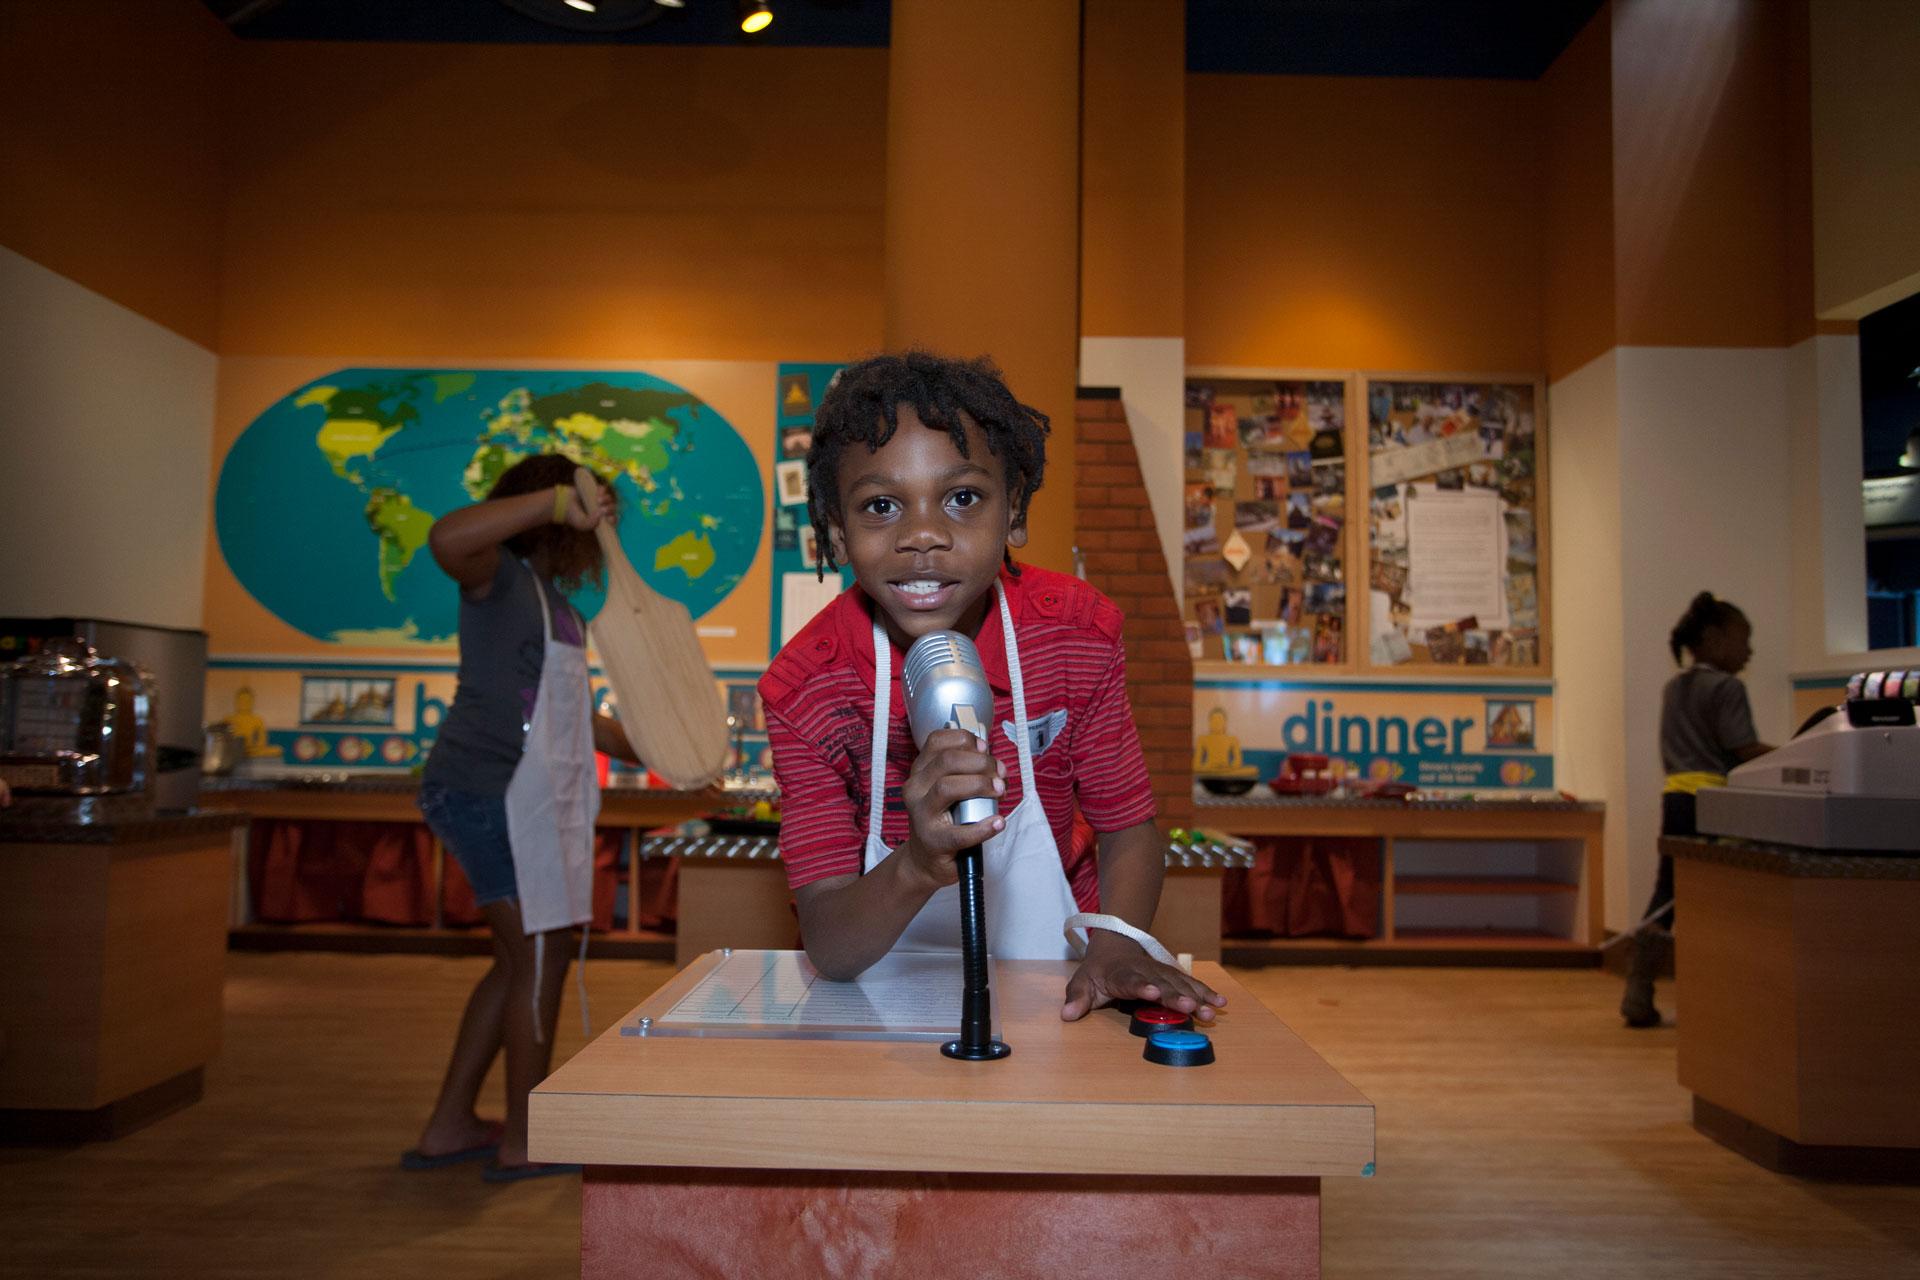 History & Mission - CMON Childrens Museum